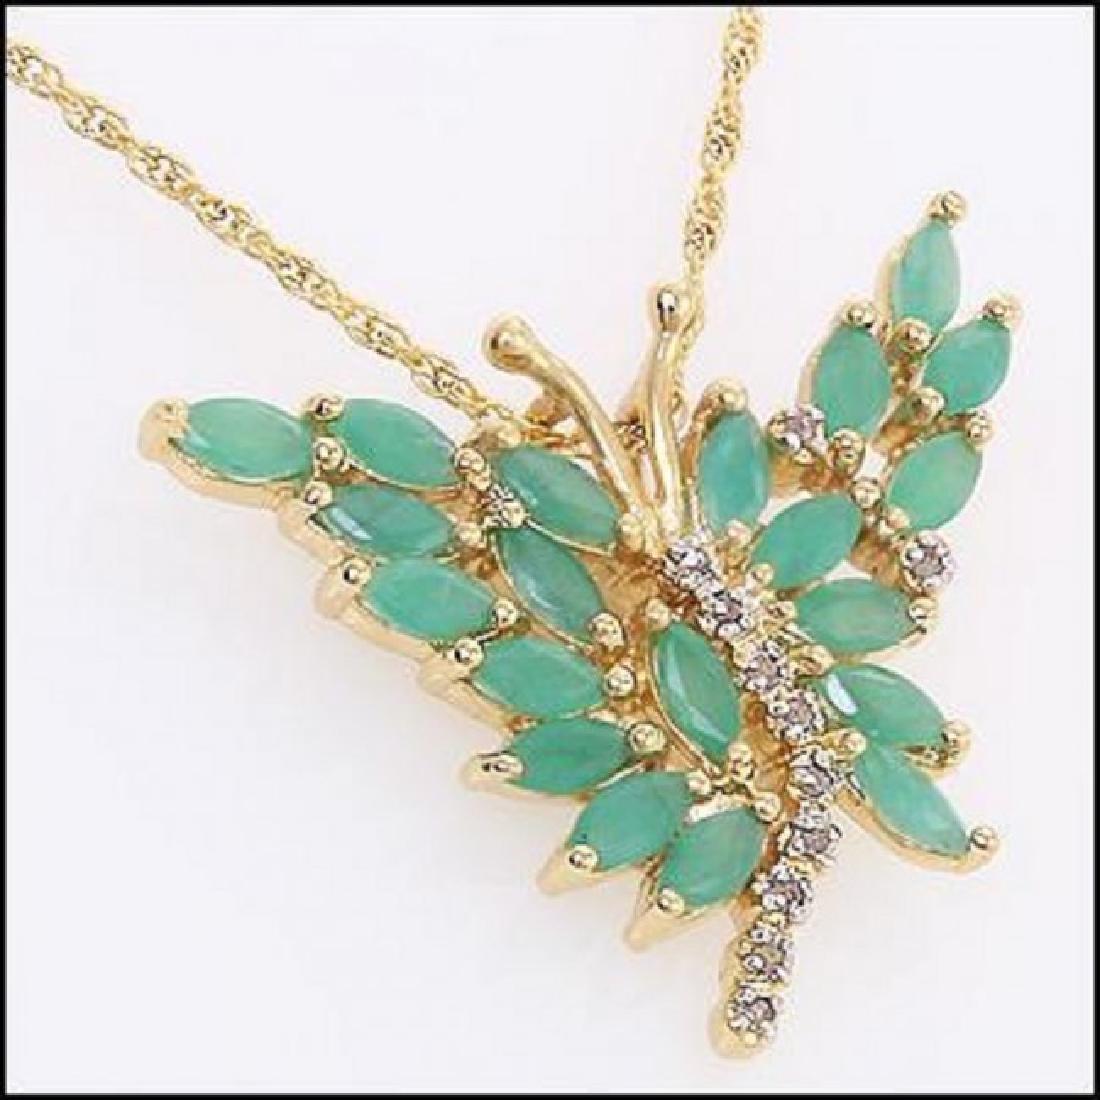 3.89 CT Green Agate & Diamond Designer Necklace $1180